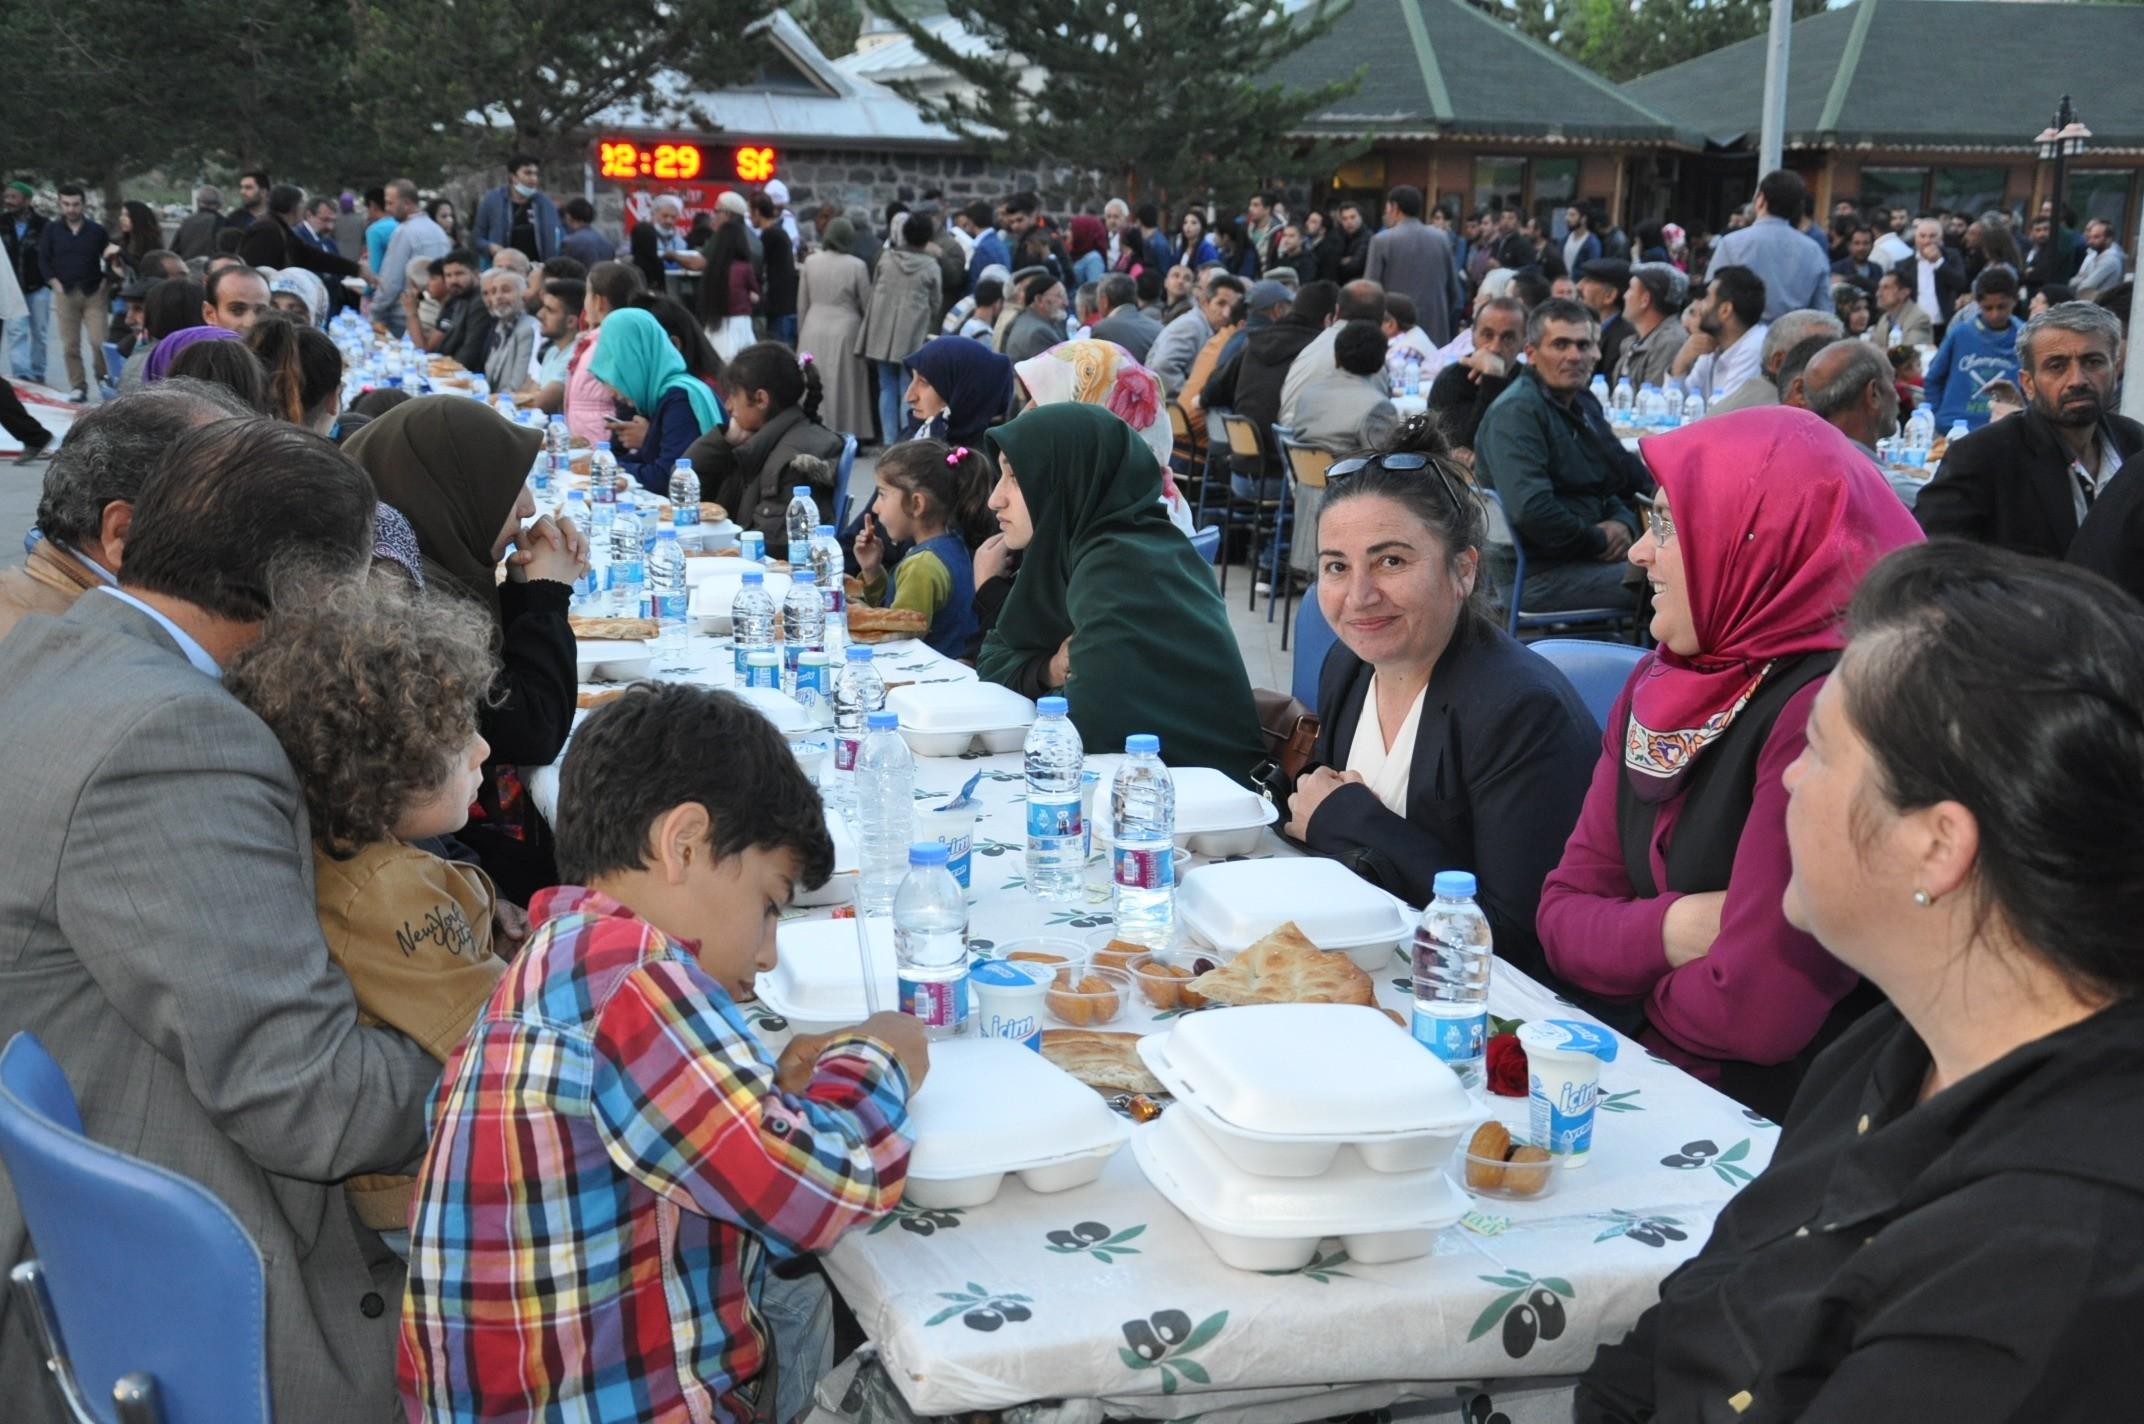 bakan-zeybekci-karsta-iftar-yemegi-(7).jpg